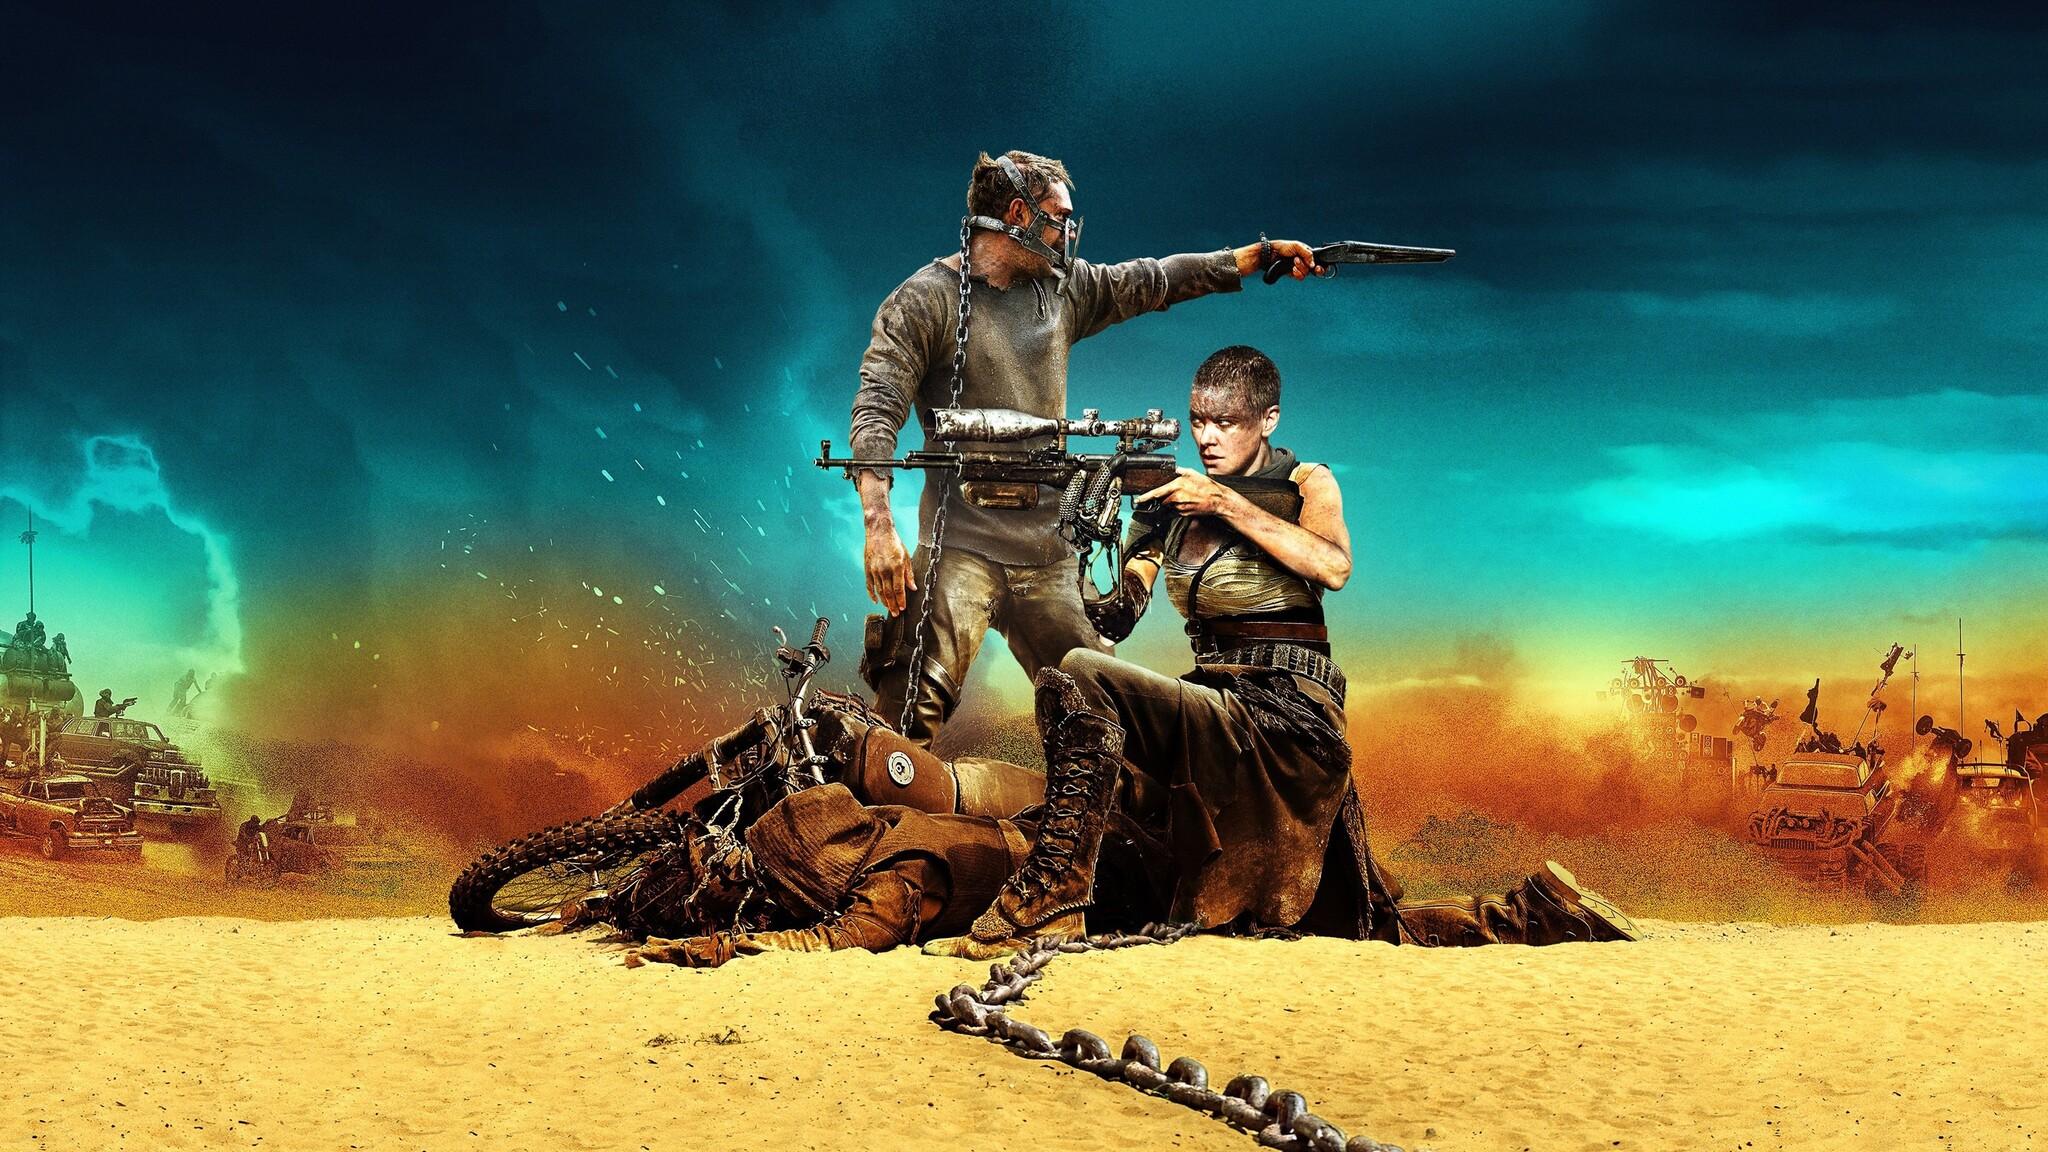 Cute Wallpapers  2048x1152 Mad Max Fury Road 2 2048x1152 Resolution Hd 4k